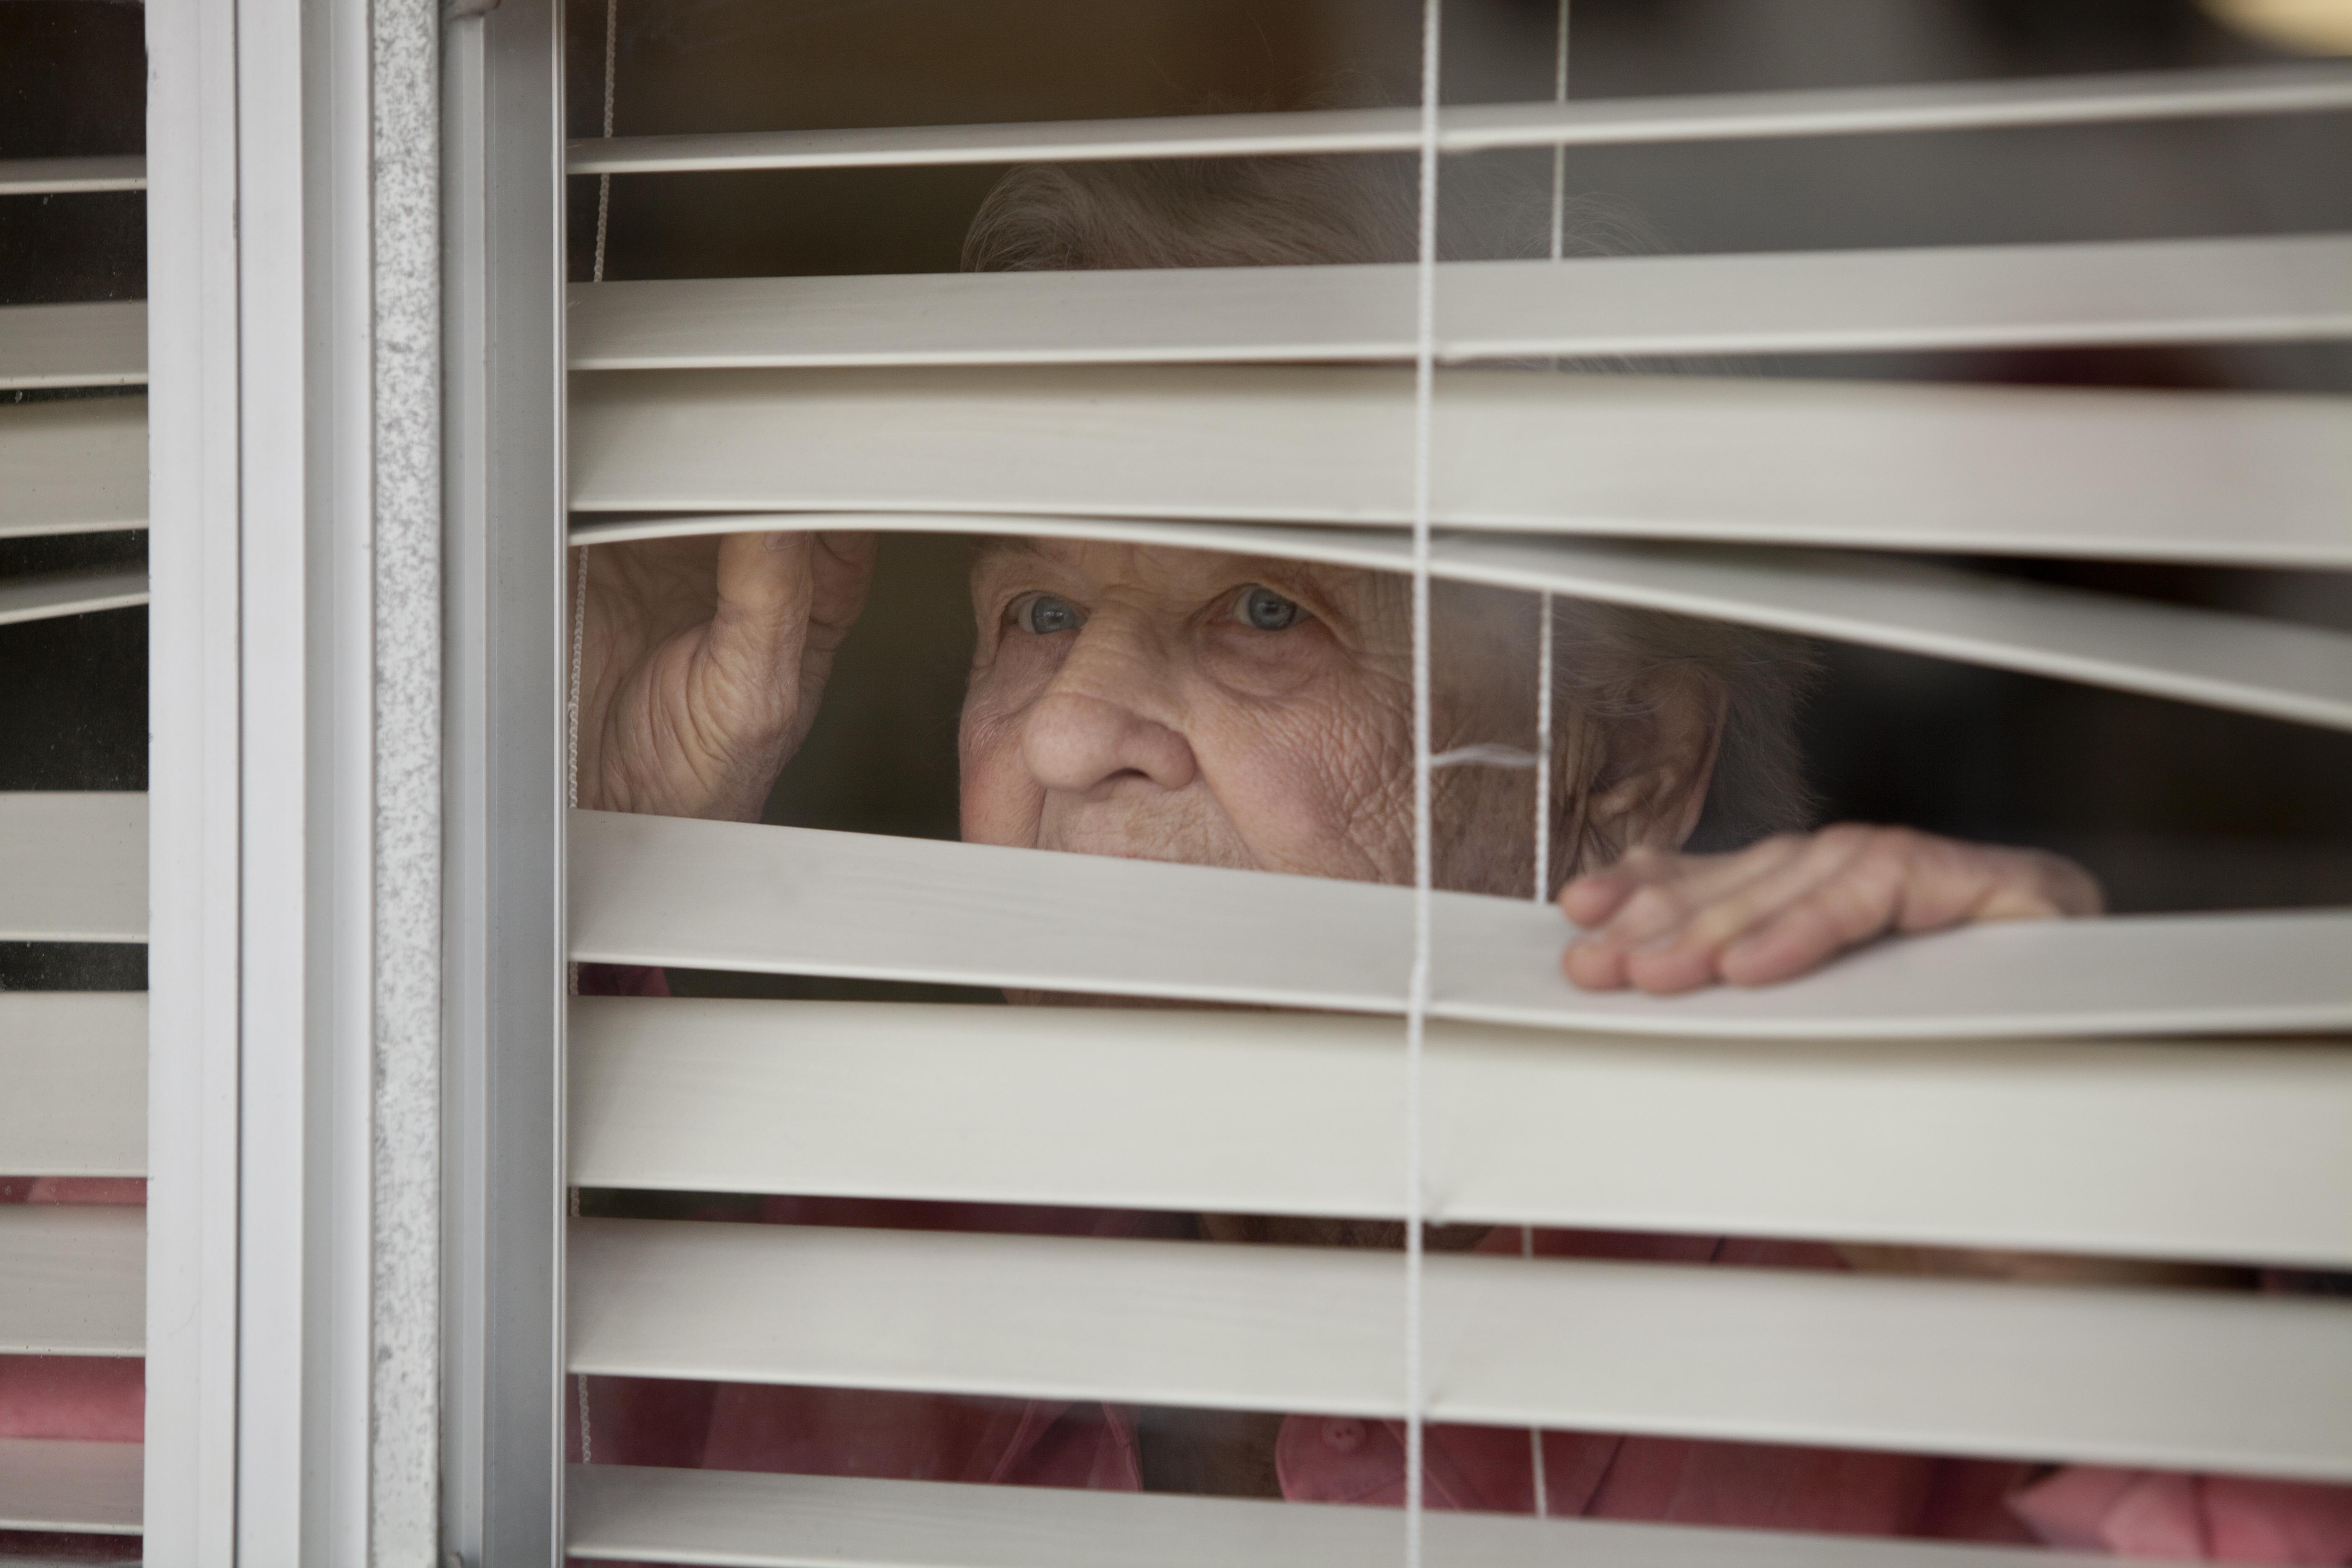 Neighbour looking through blinds